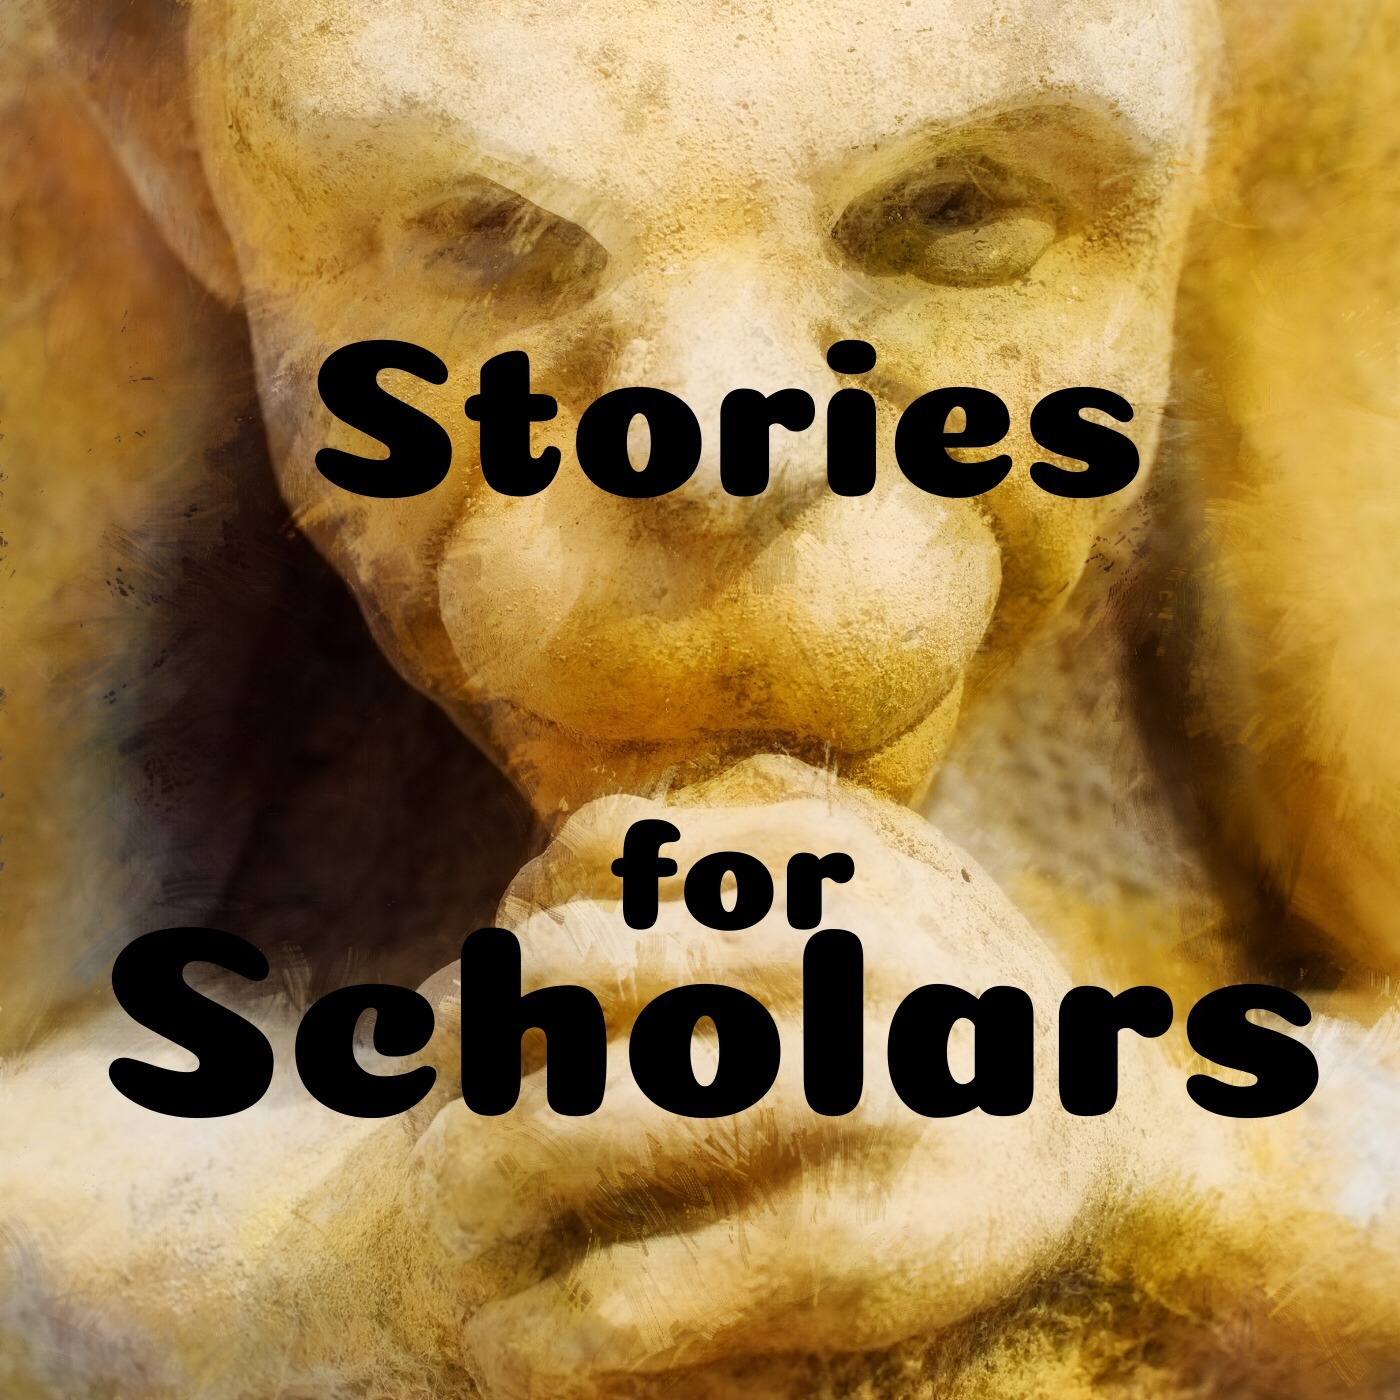 Stories for Scholars - White Hare, Vol. VI